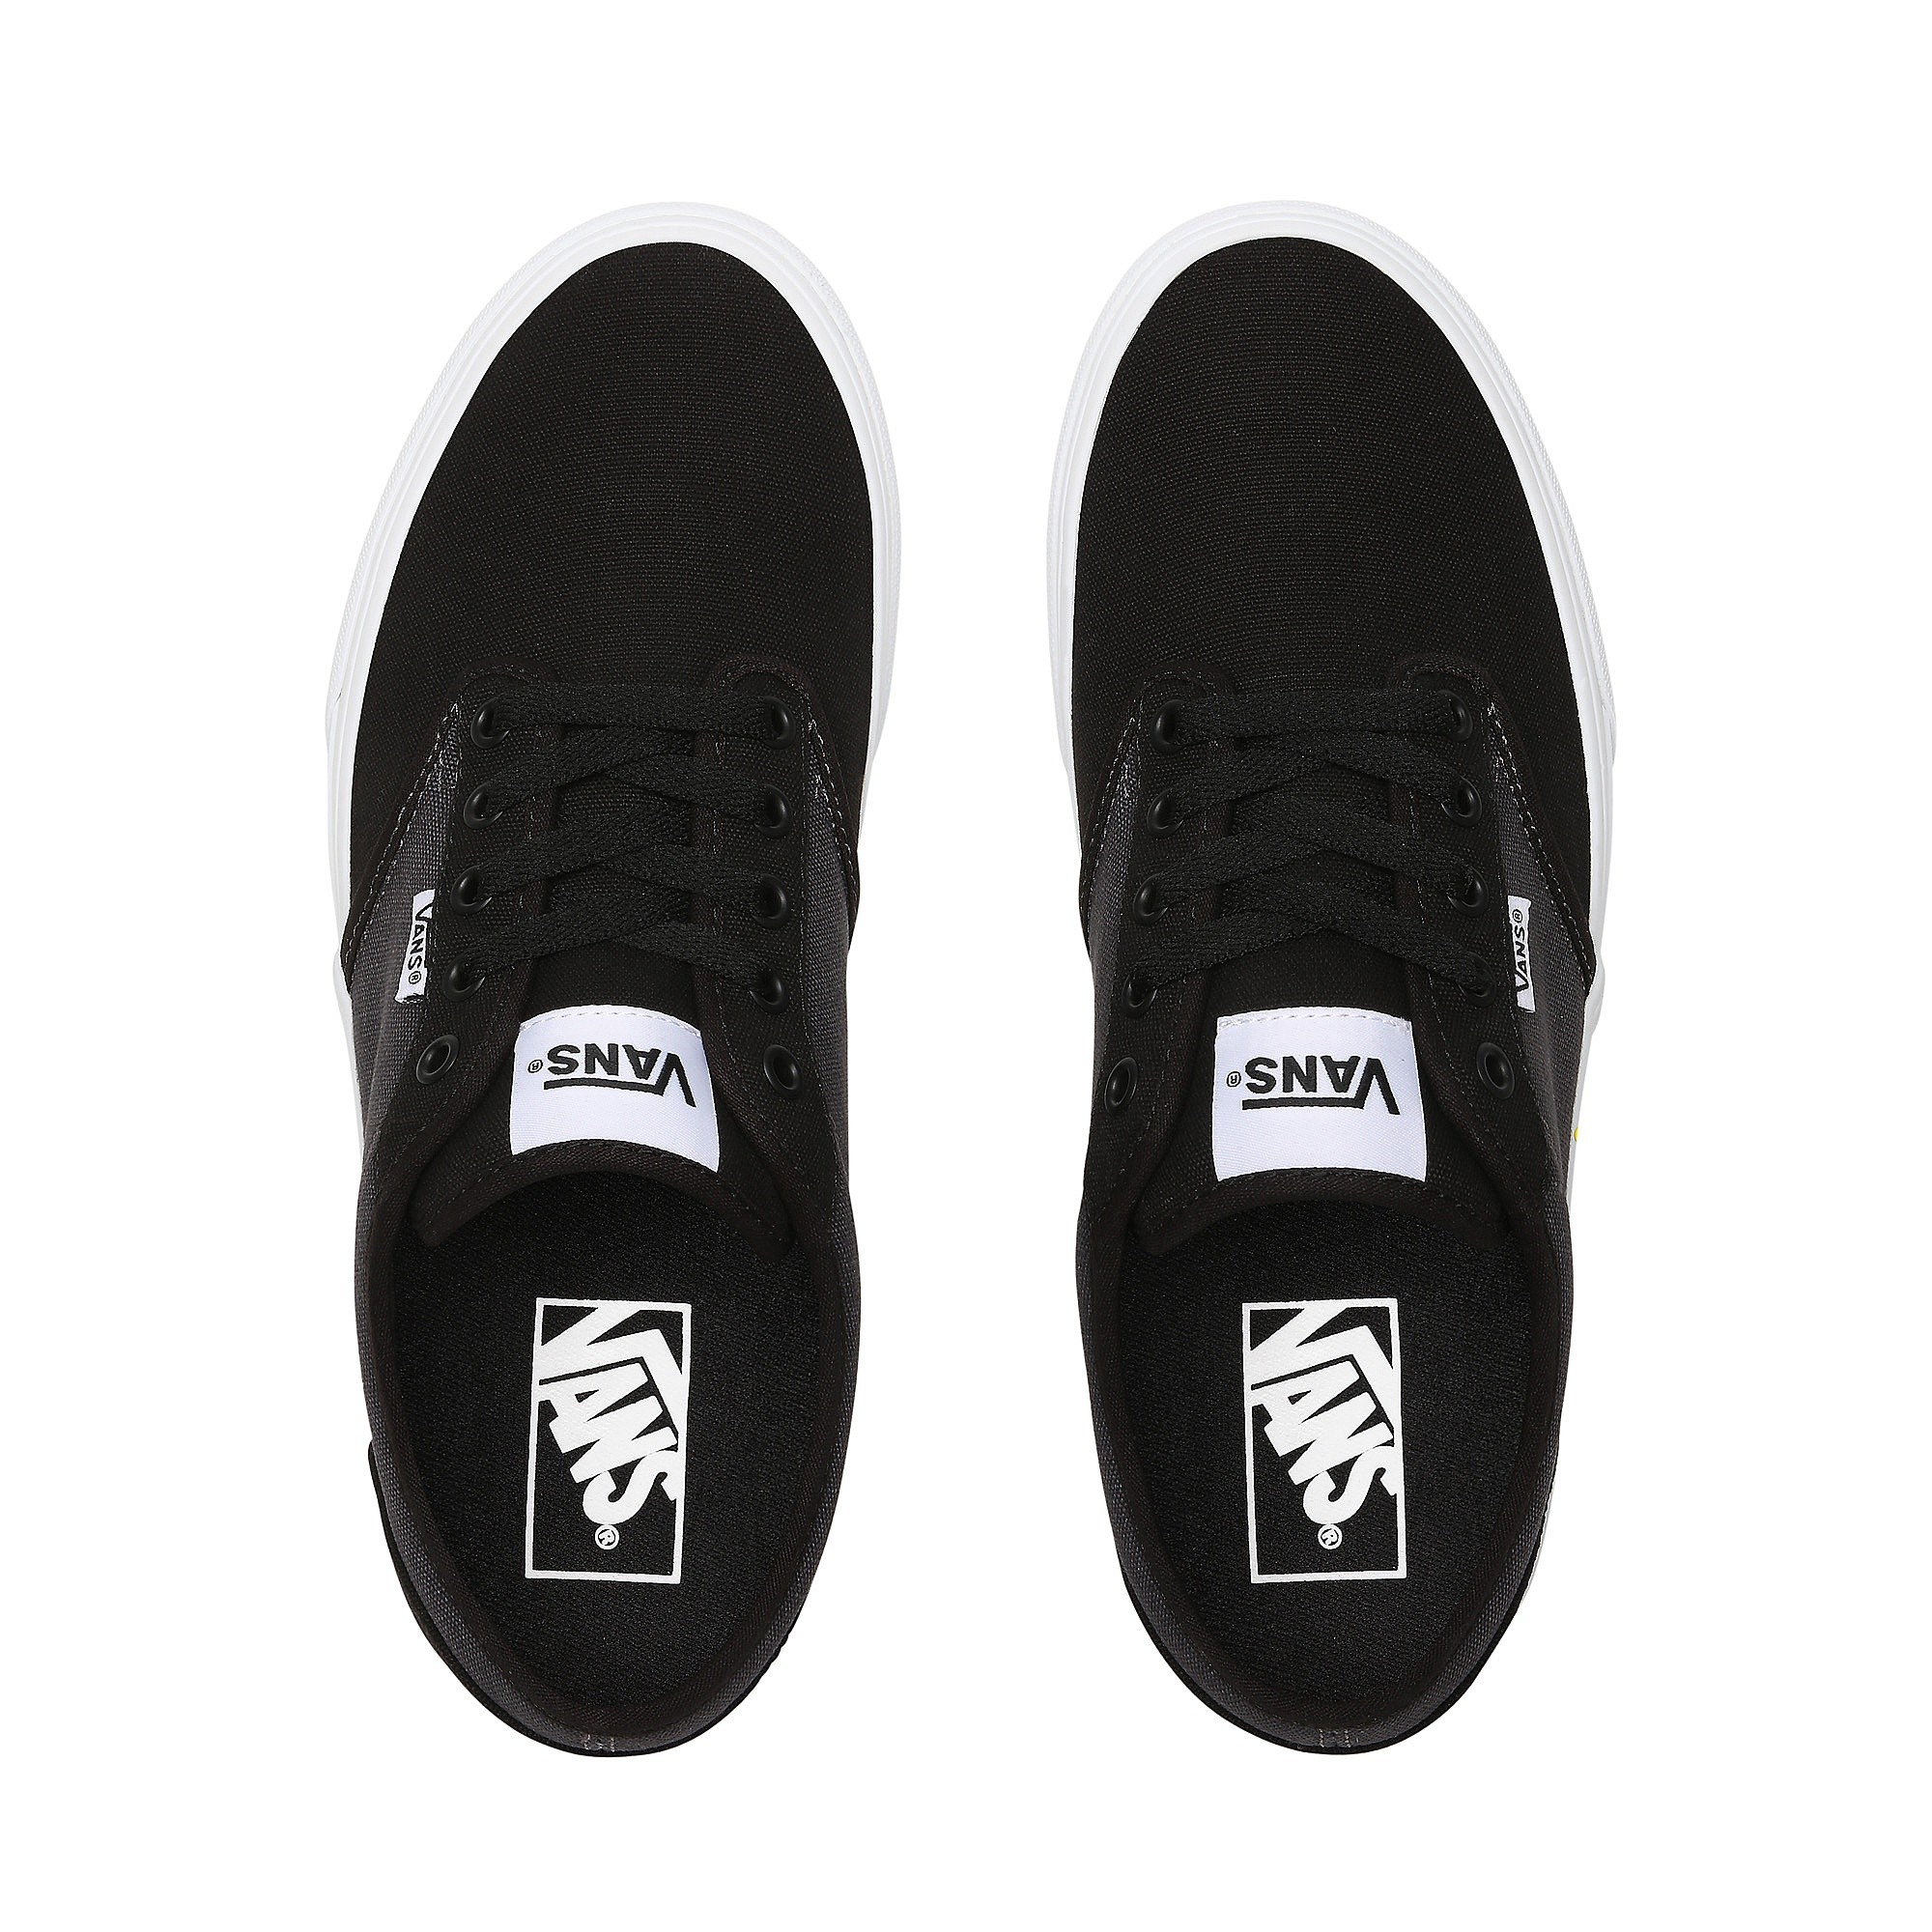 shoes Vans Atwood - OTW/Black/White